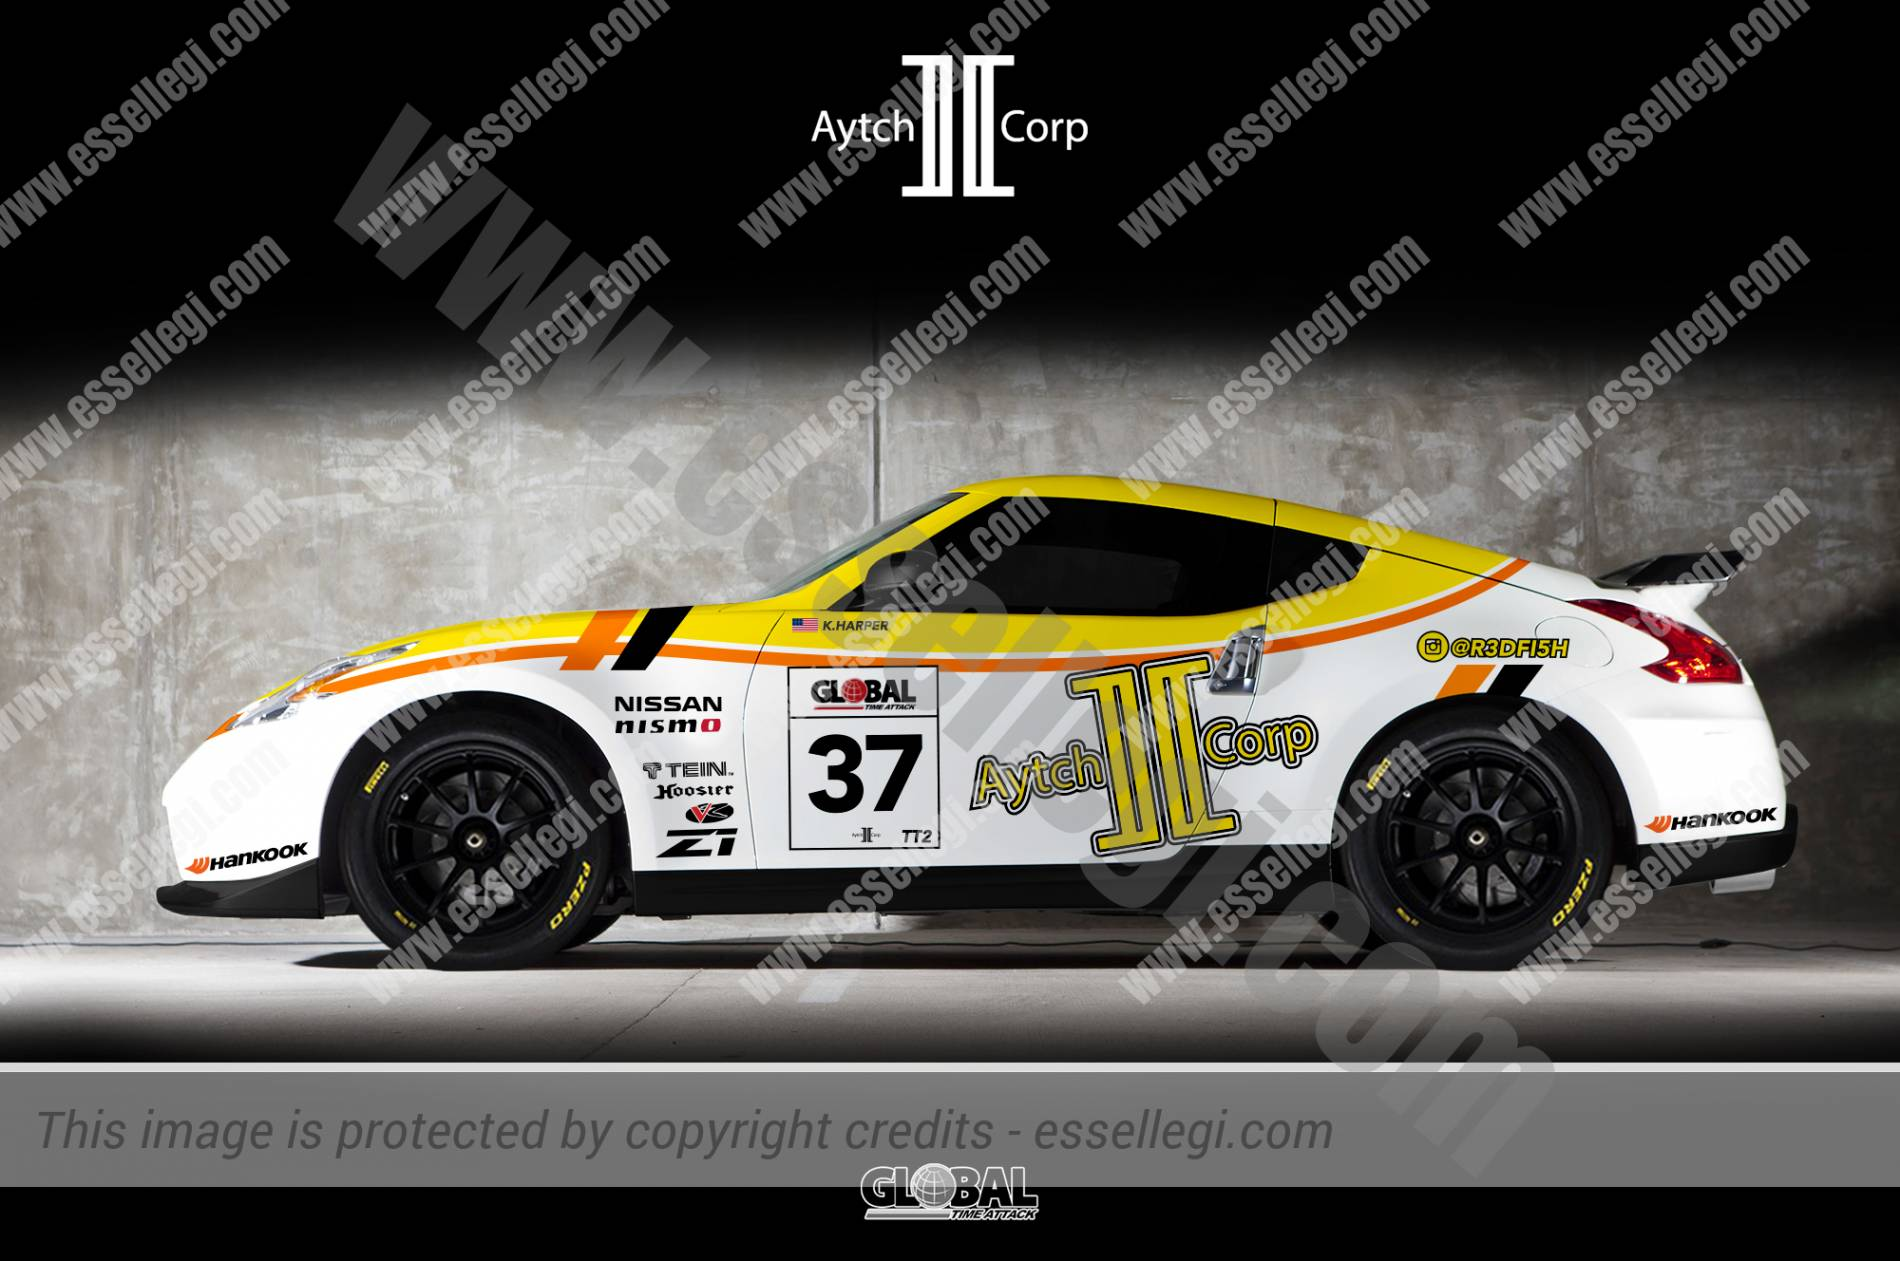 Nissan 370z Motorsport Racing Race Car Livery